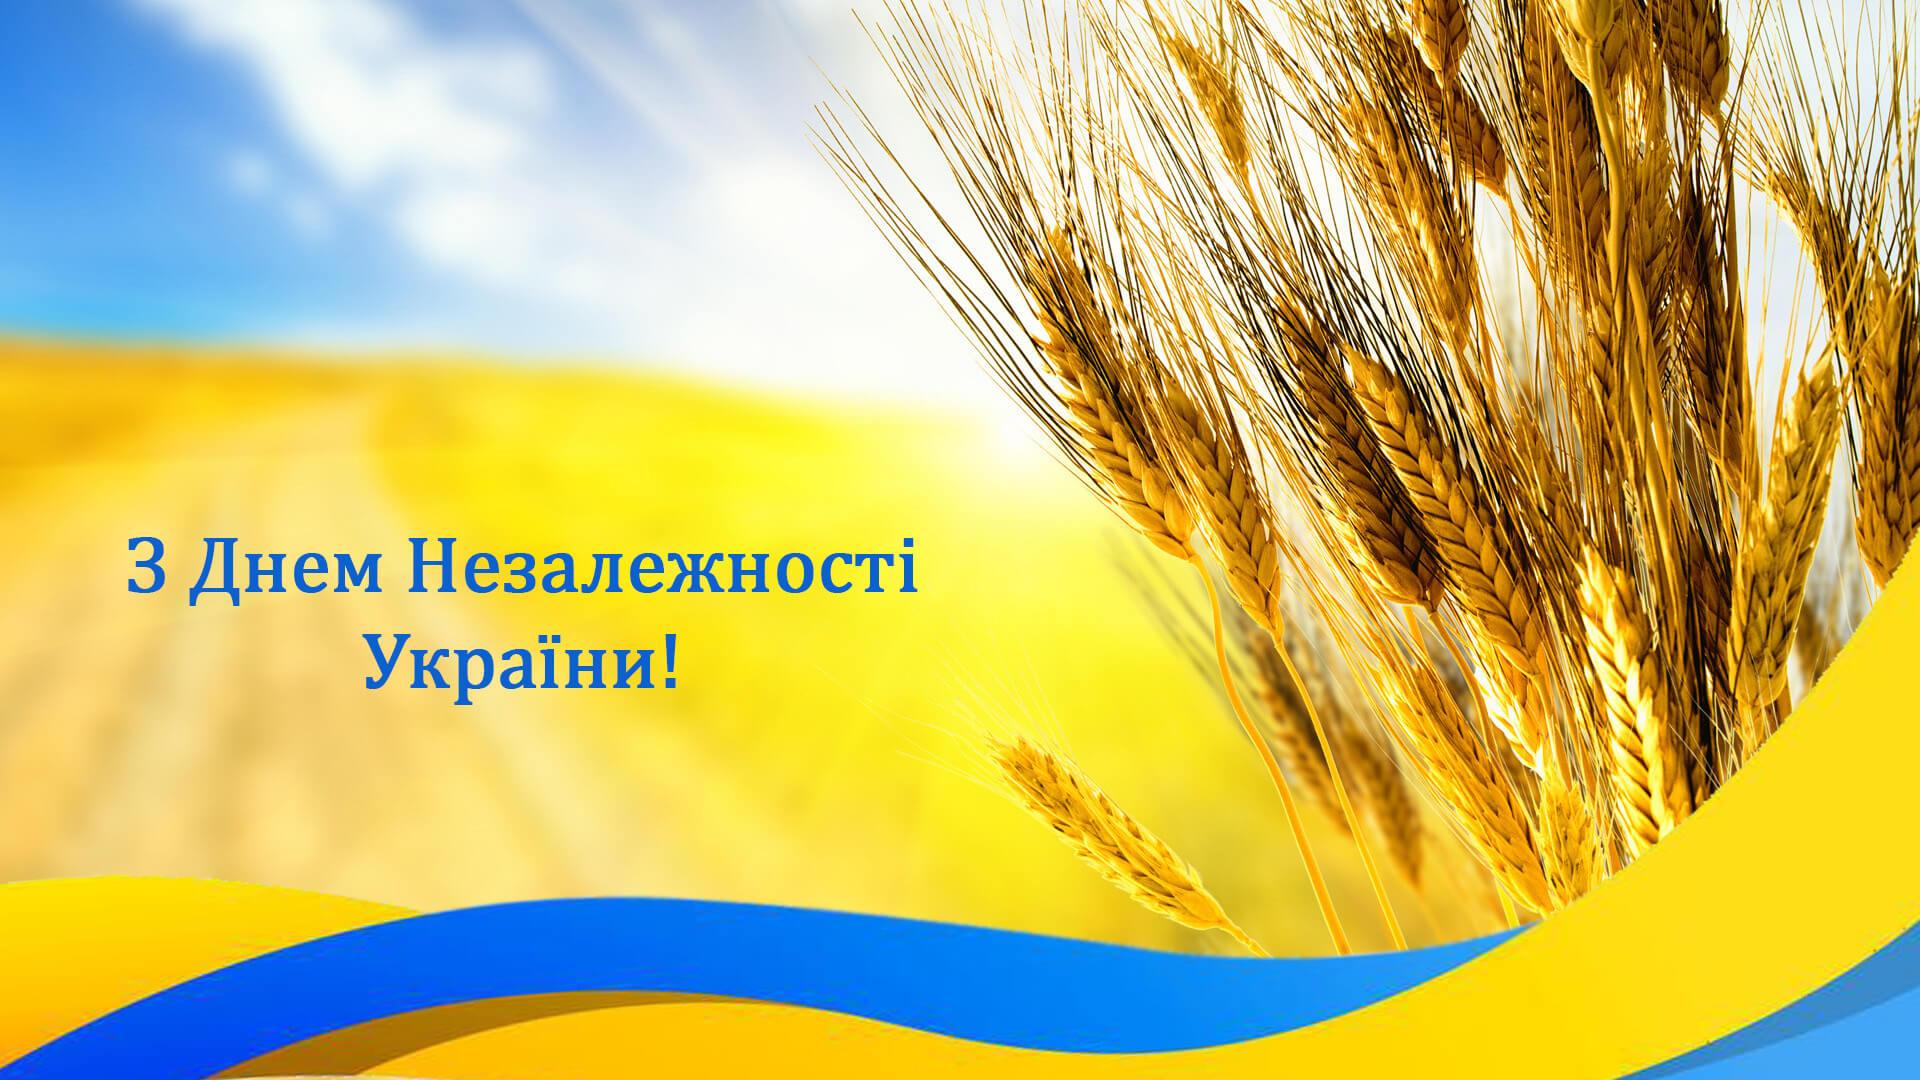 YUZHMASH congratulates on the Independence Day of Ukraine